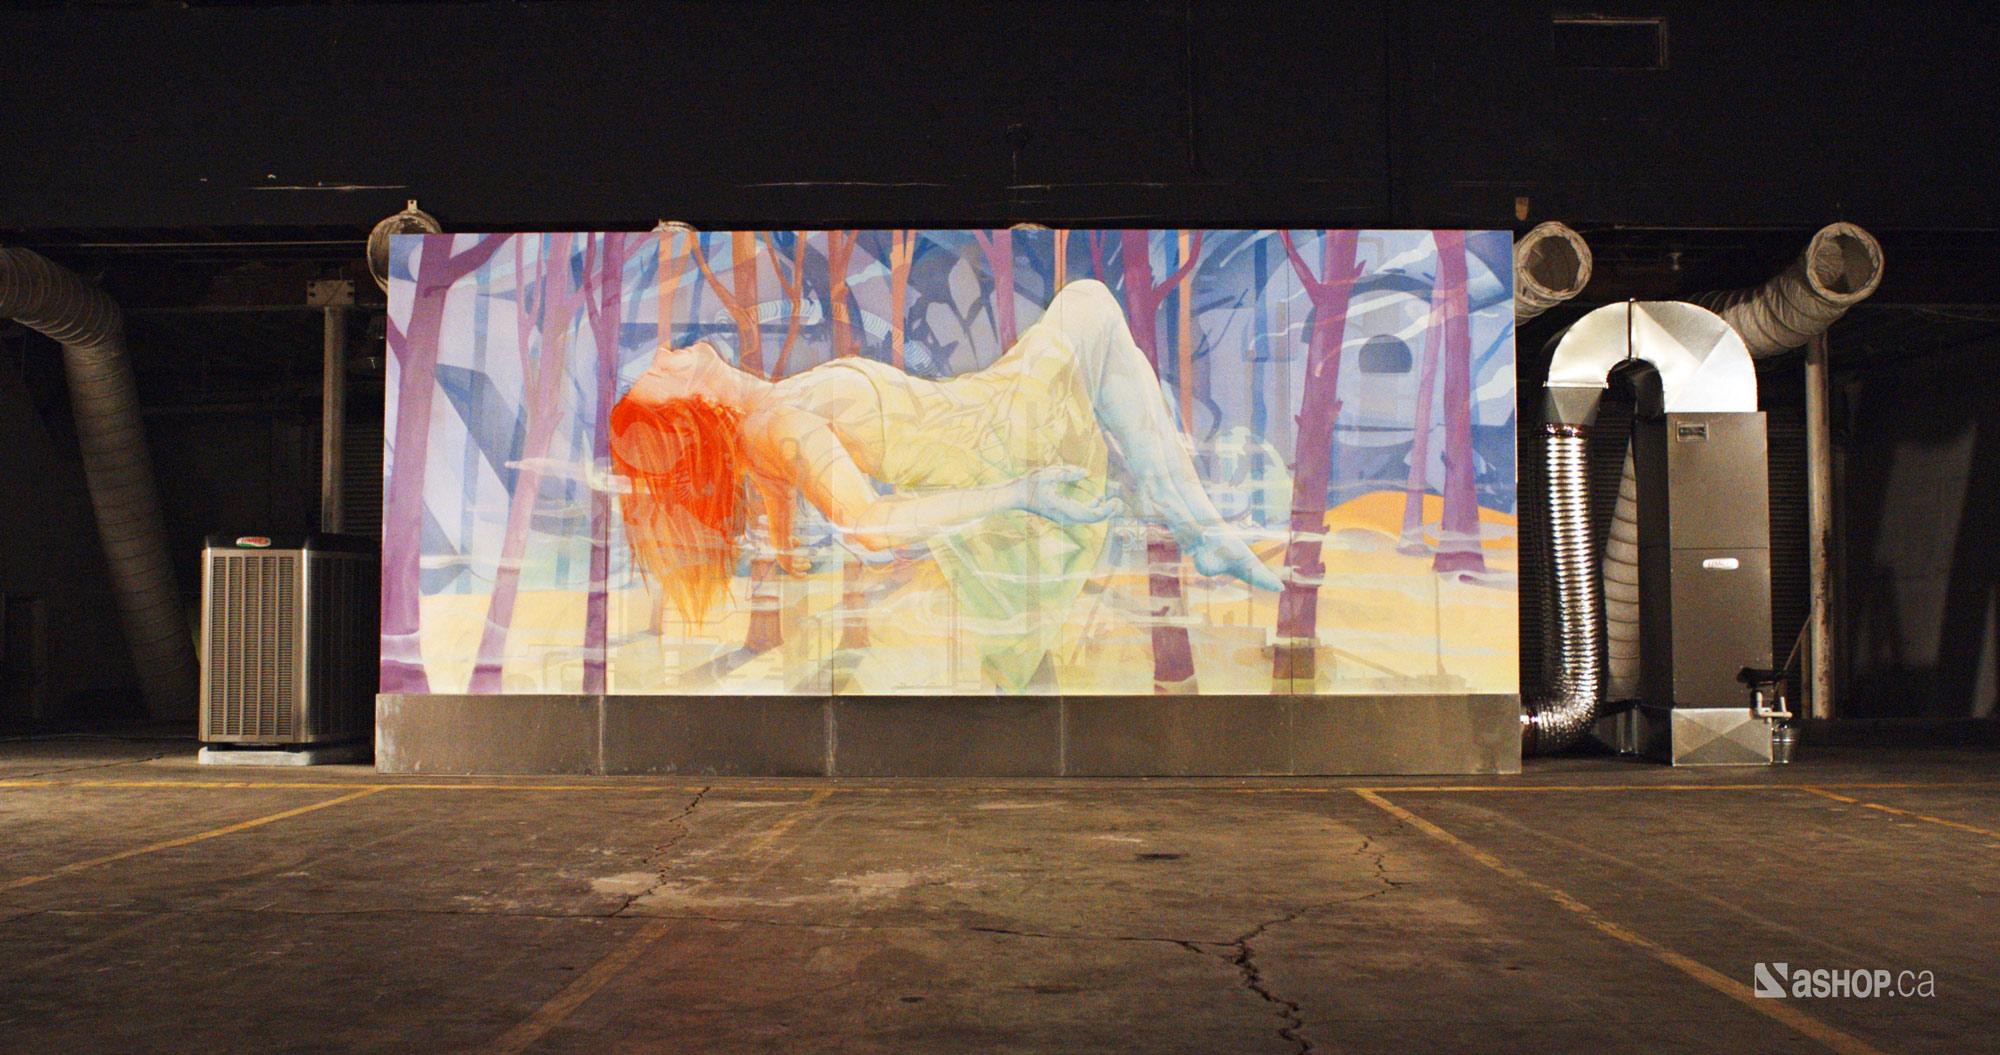 lennox_dodo_before_ashop_a'shop_mural_murales_graffiti_street_art_montreal_paint_WEB.jpg